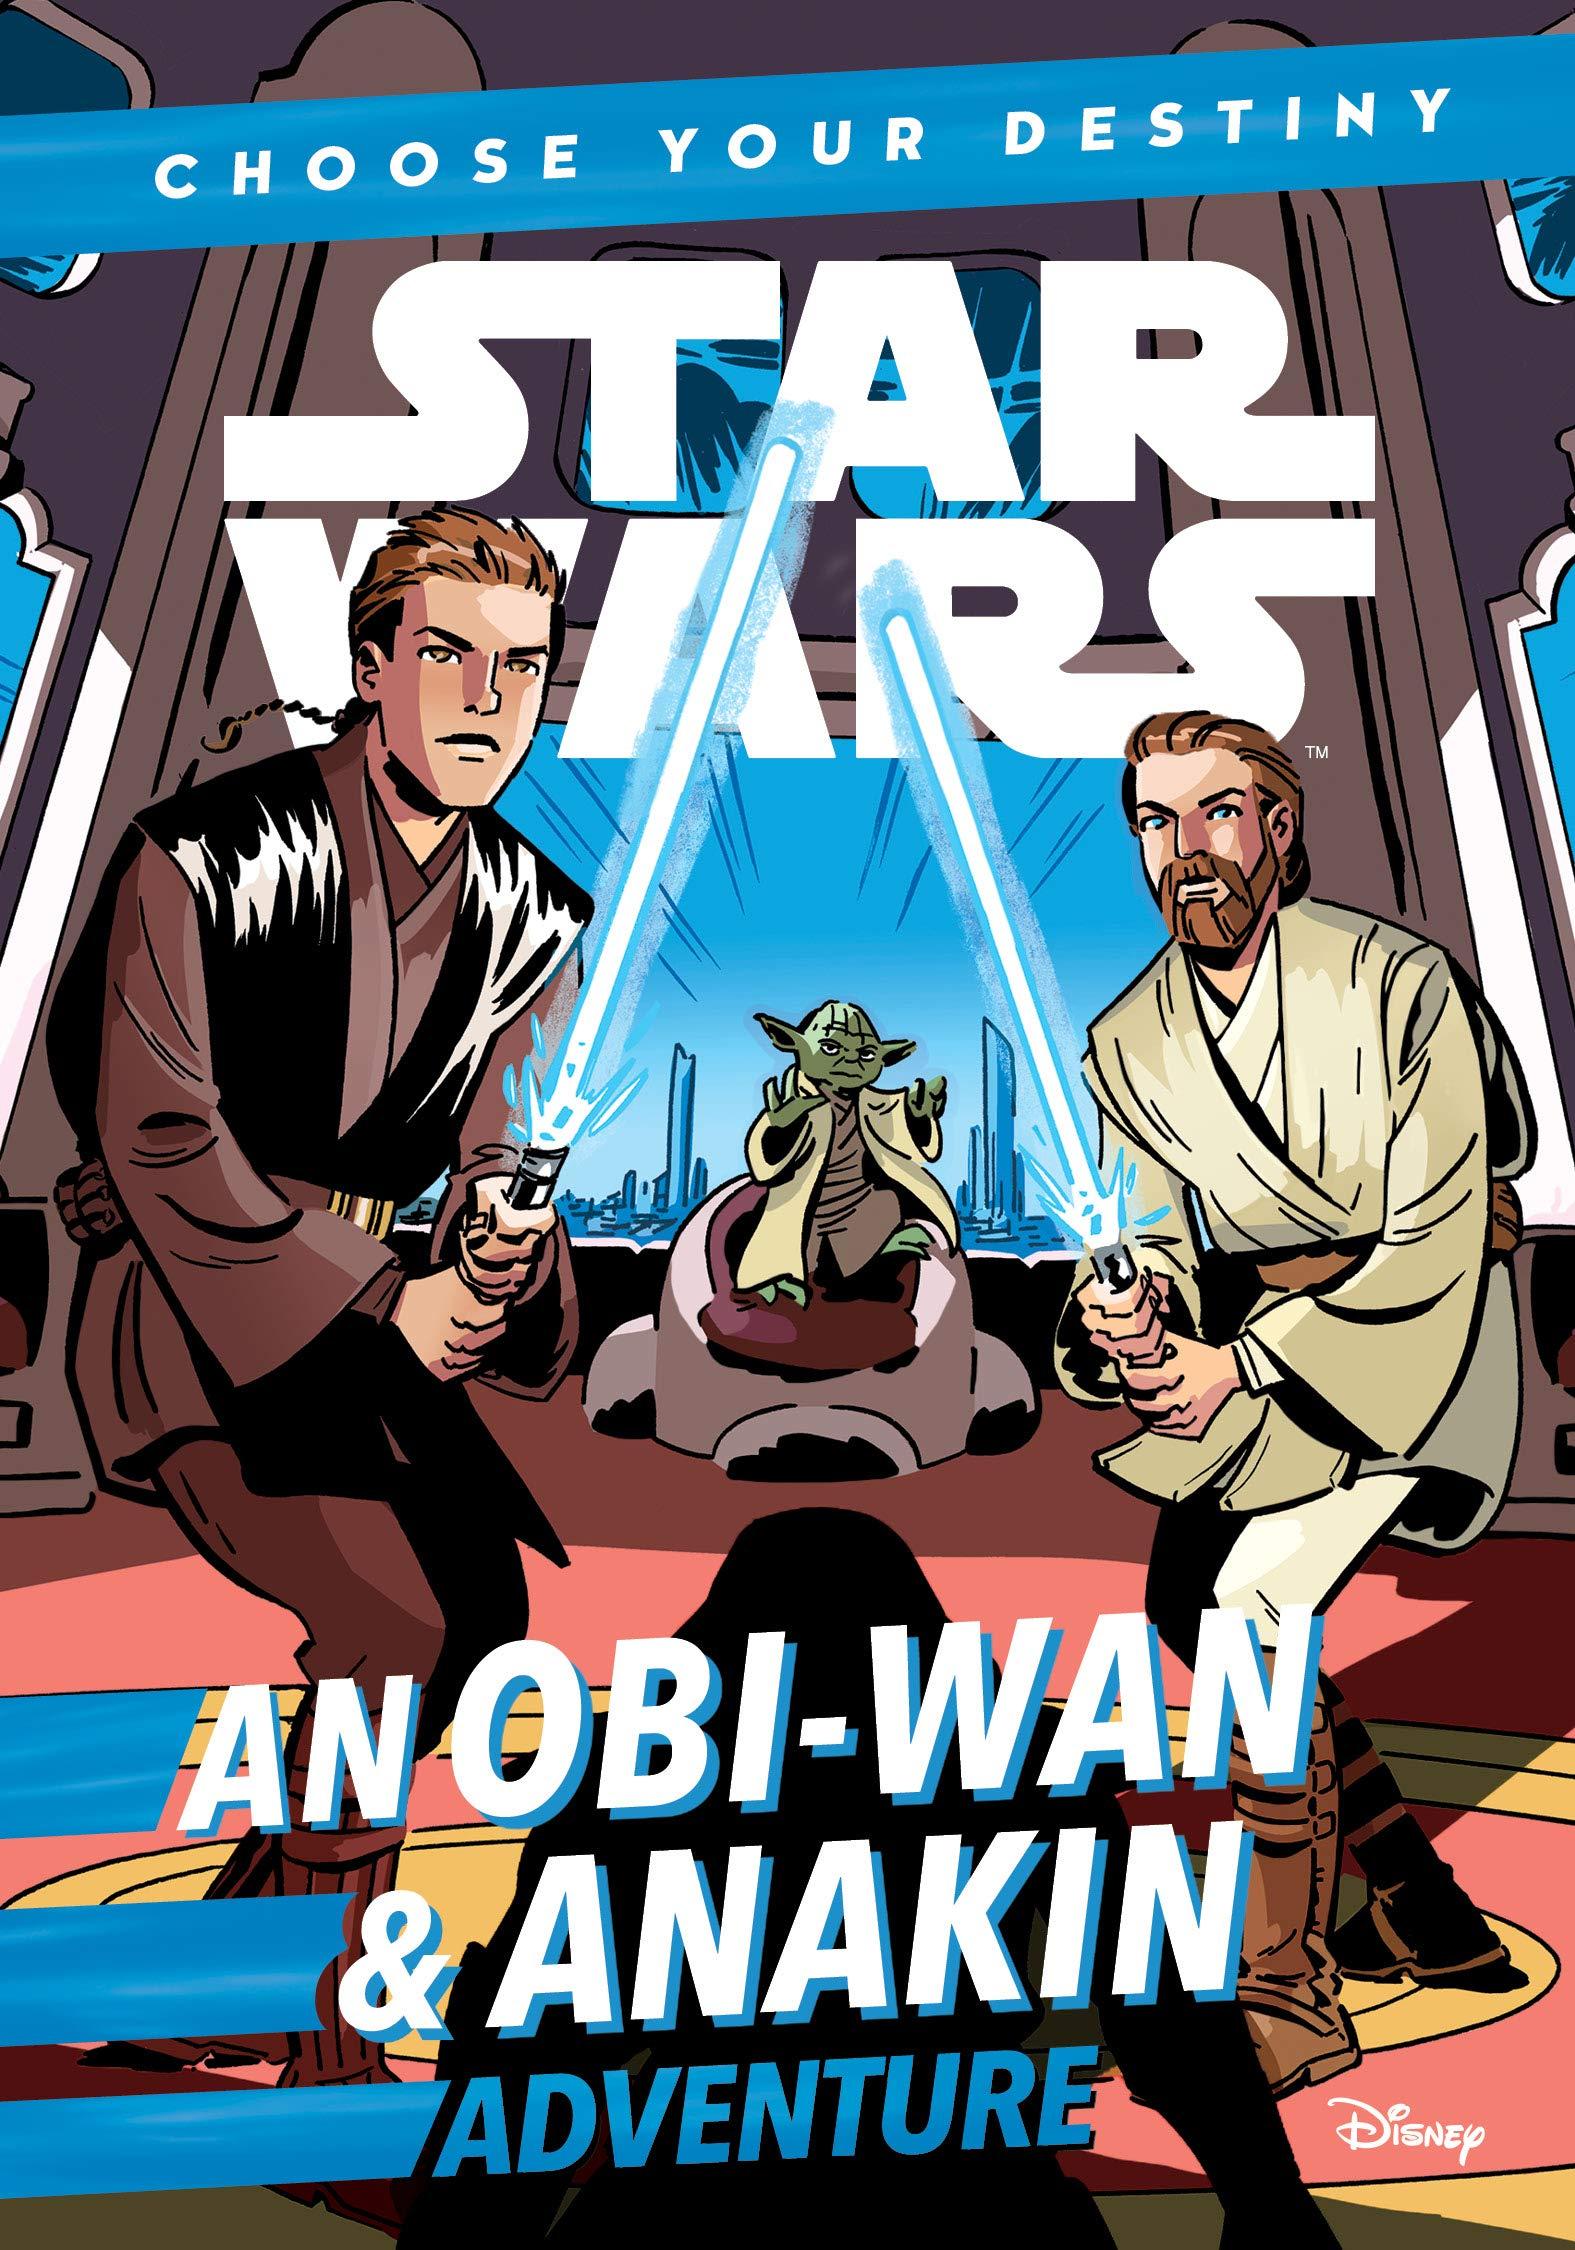 Choose Your Destiny: An Obi-Wan & Anakin Adventure